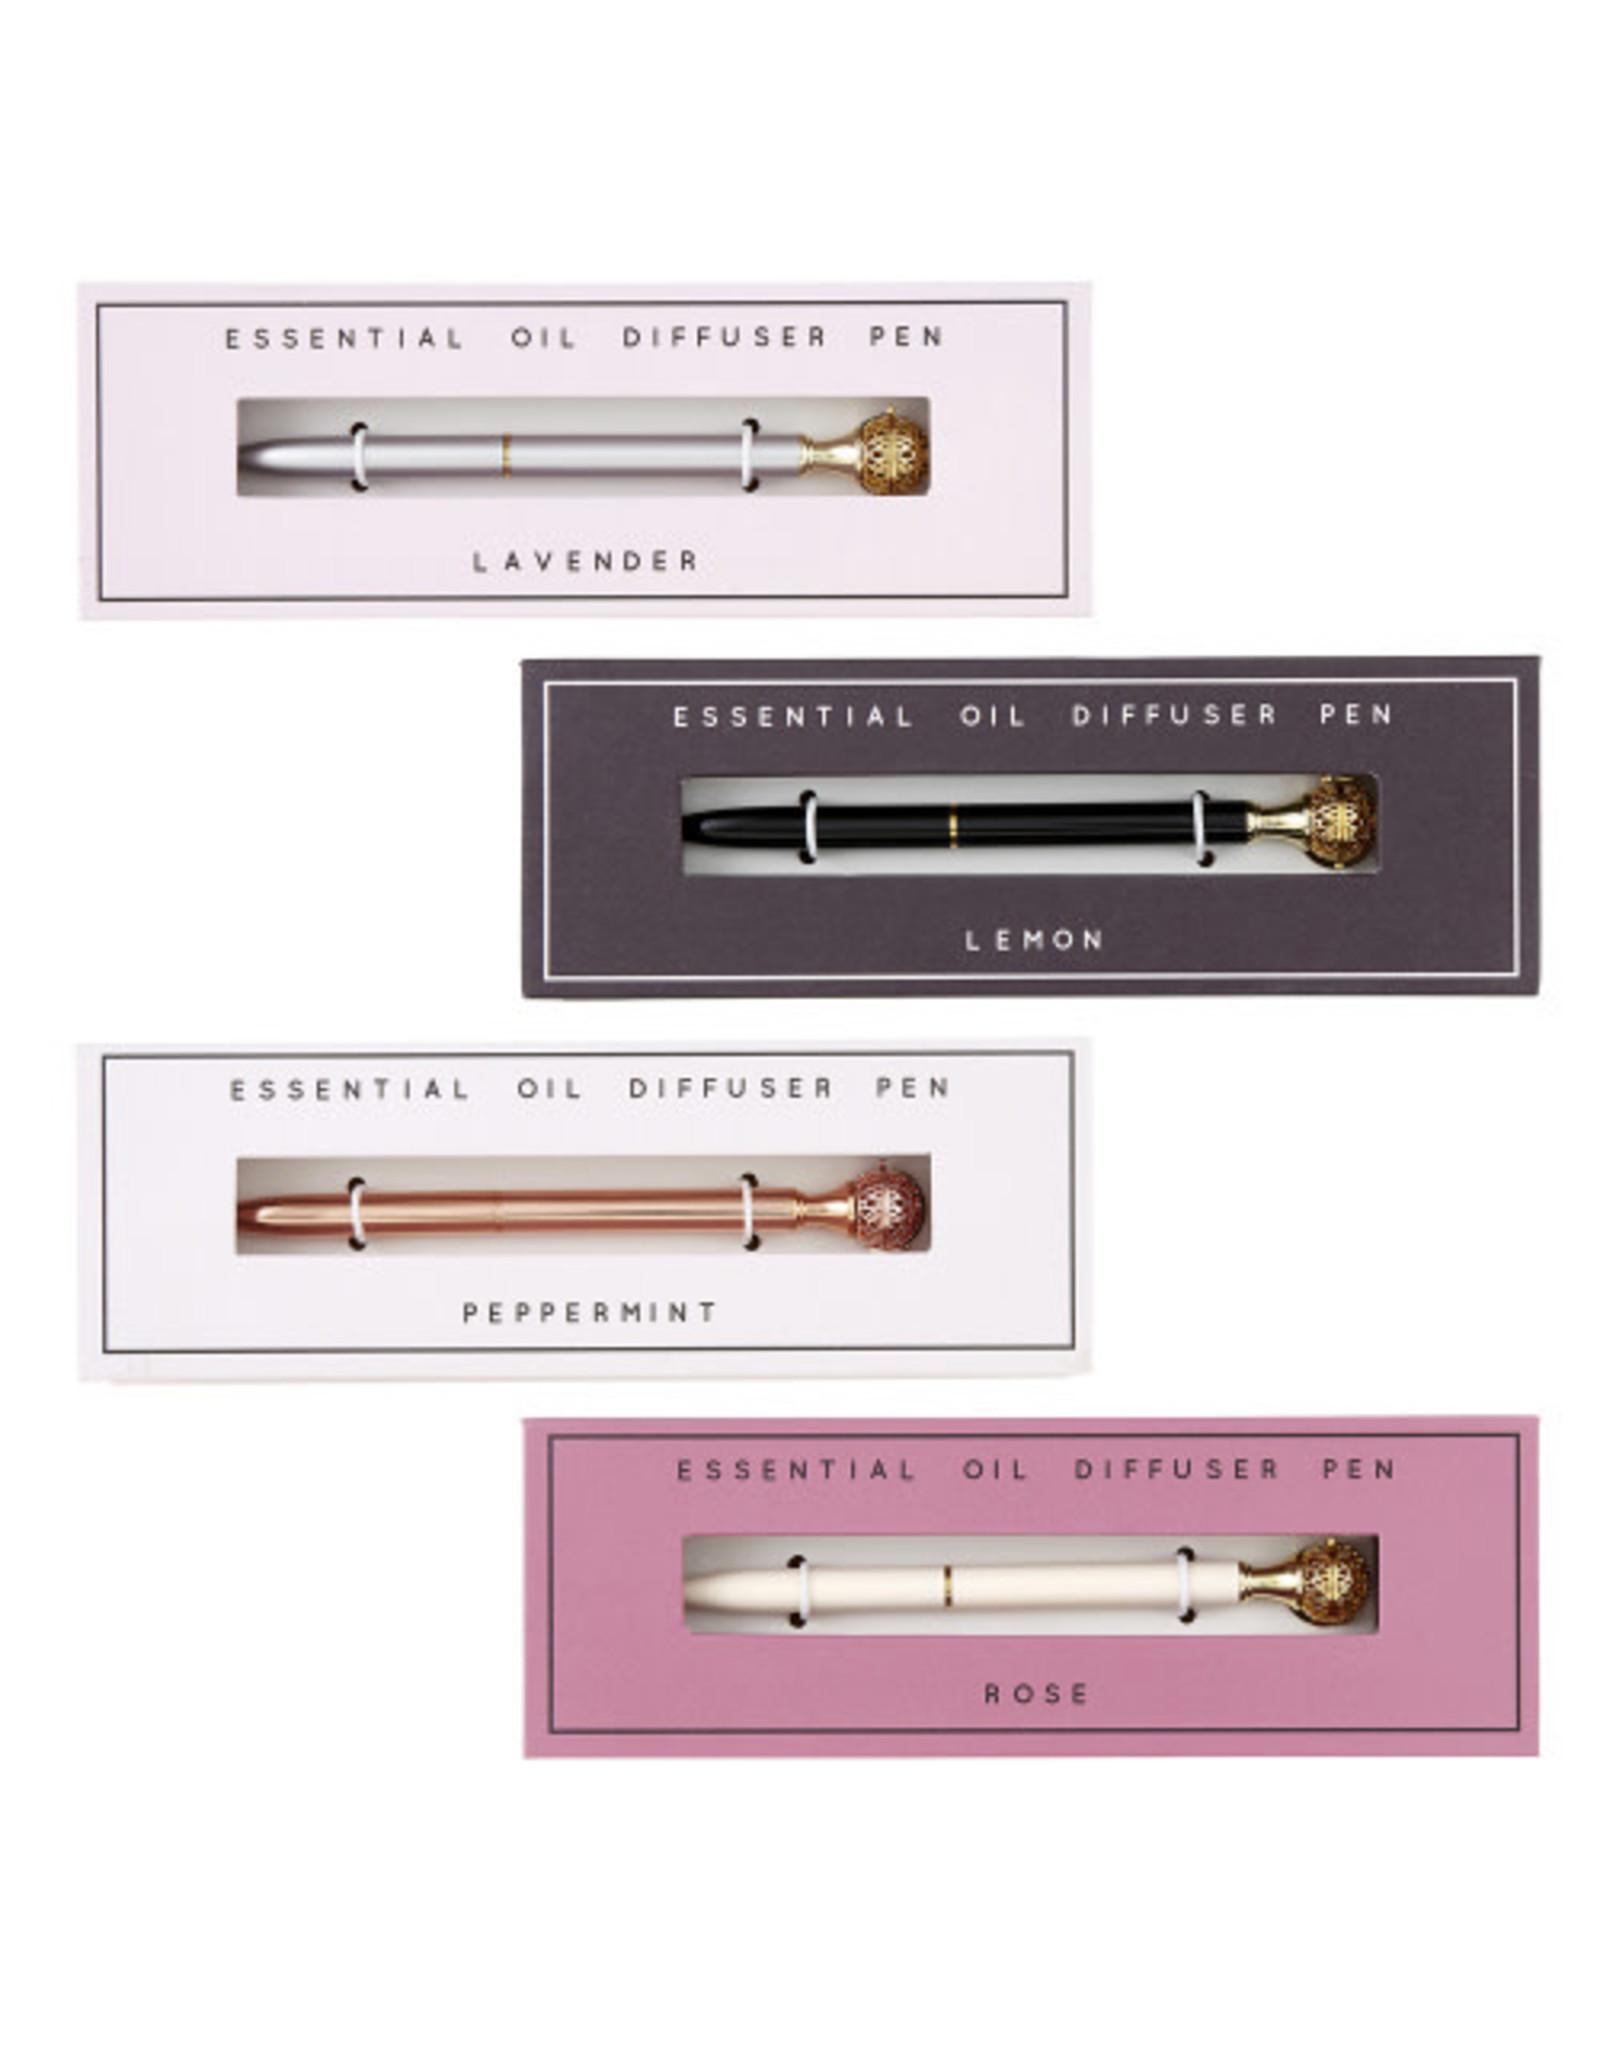 Creative Brands Essential Oil Diffuser Pens